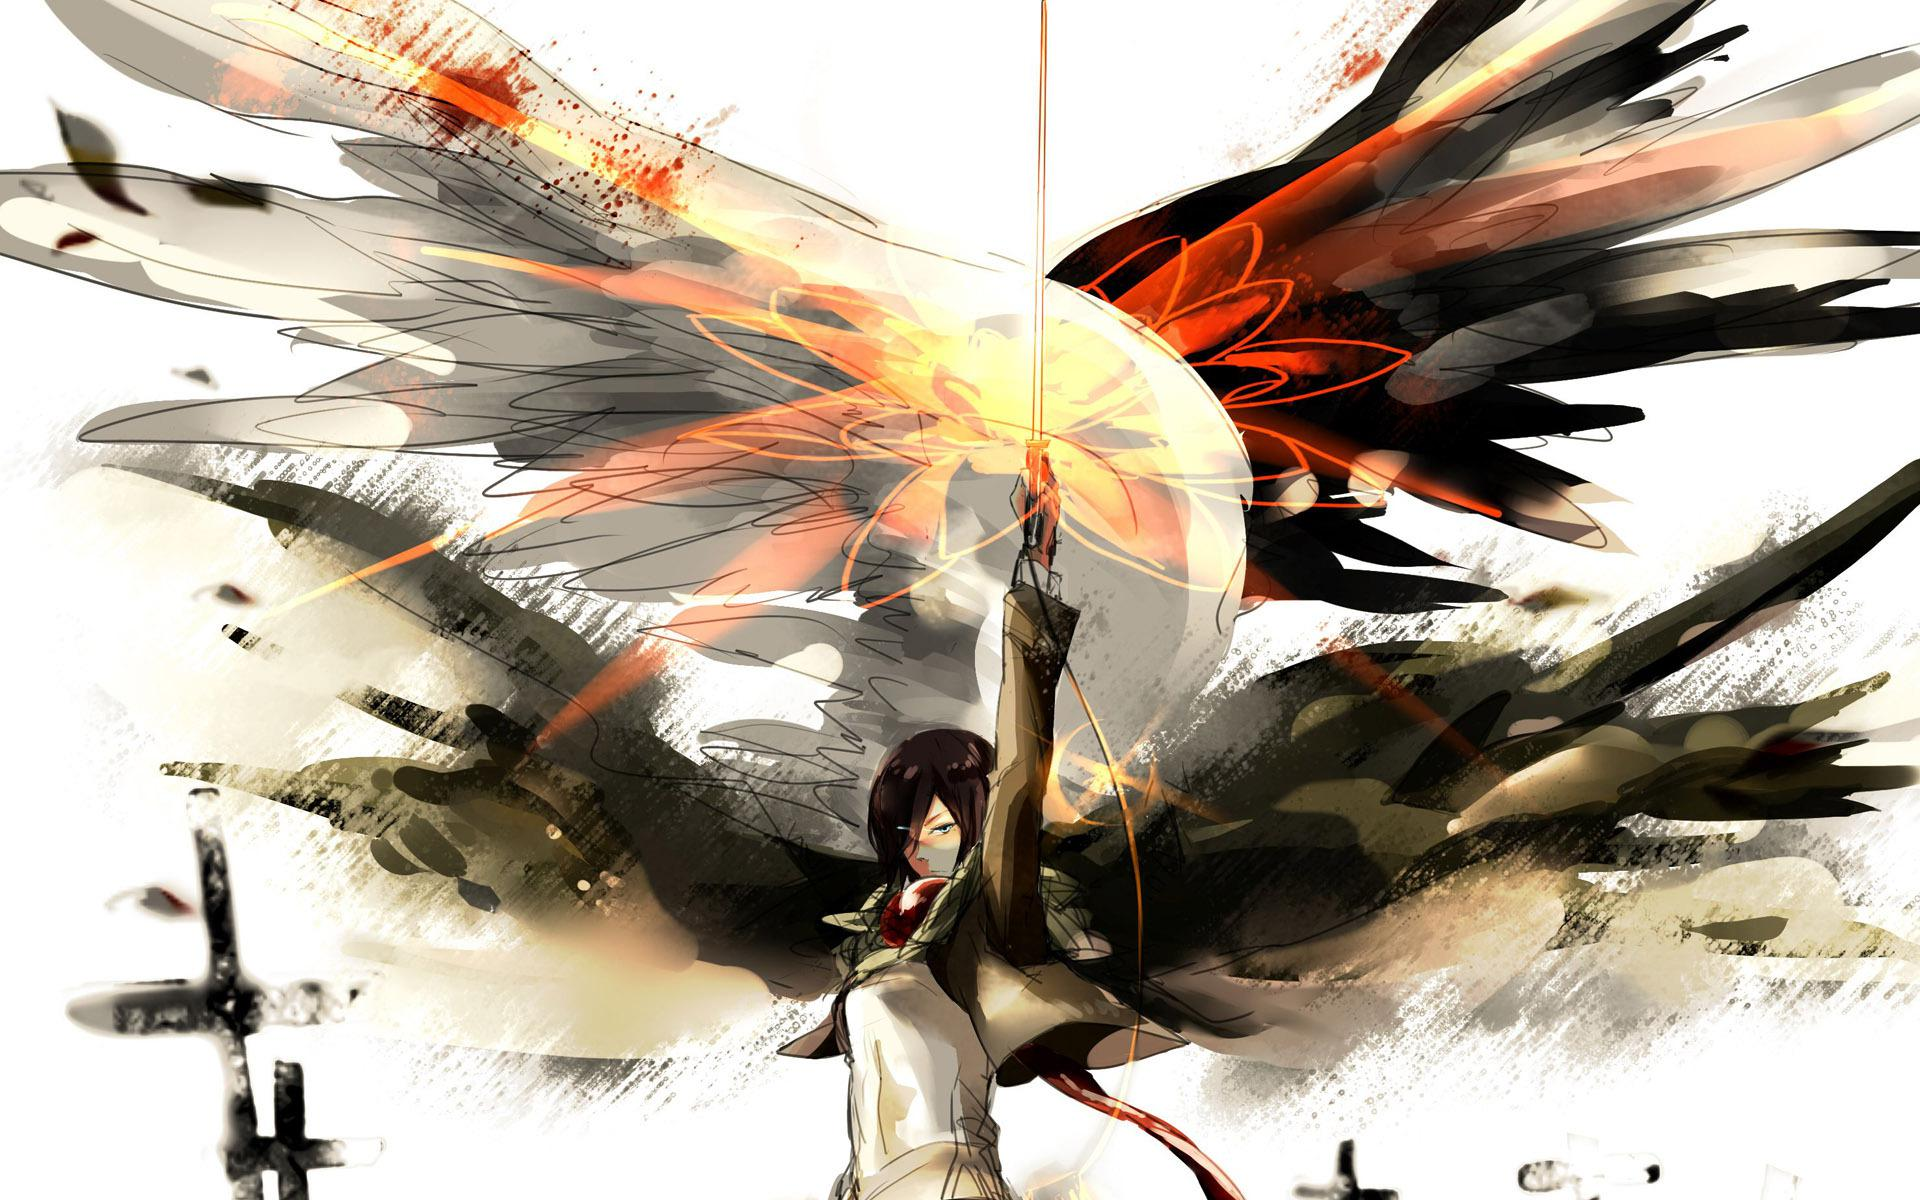 Anime Attack On Titan Wallpaper For Pc 1920x1200 Wallpaper Teahub Io